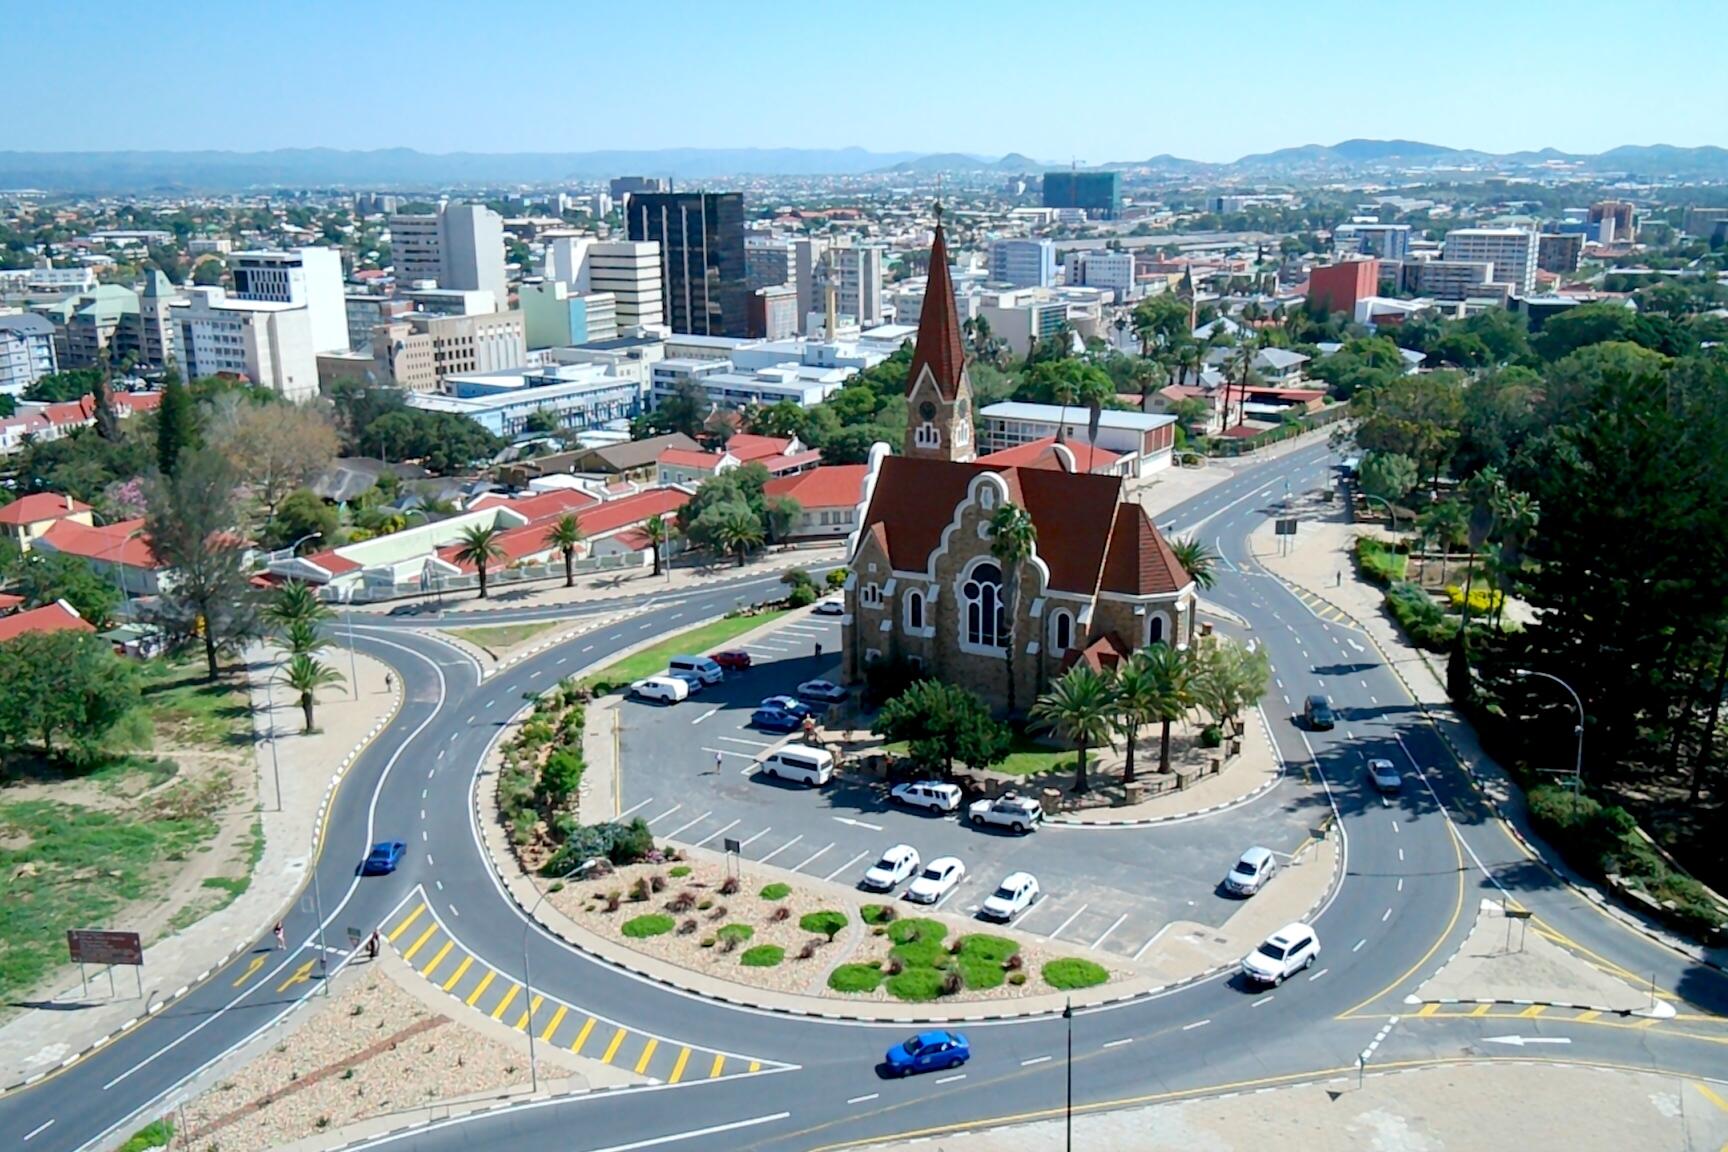 windhoek-namibia-city-center-lustforthesublime